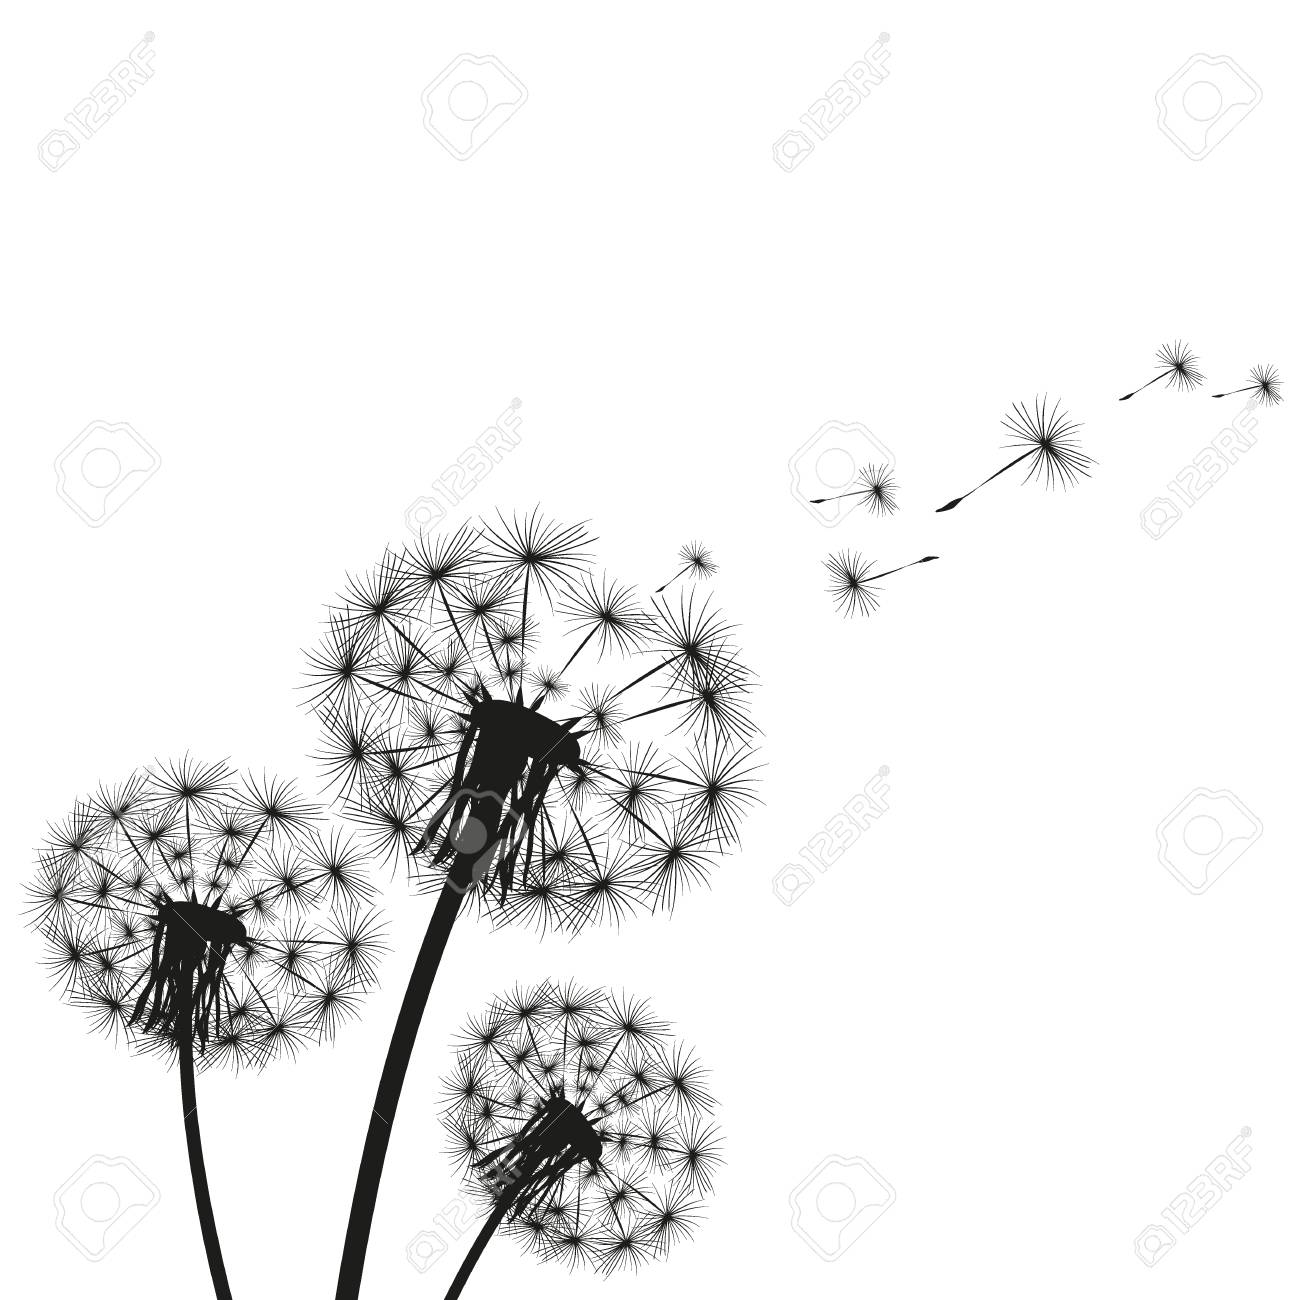 Silhouette of a dandelion - 93626632